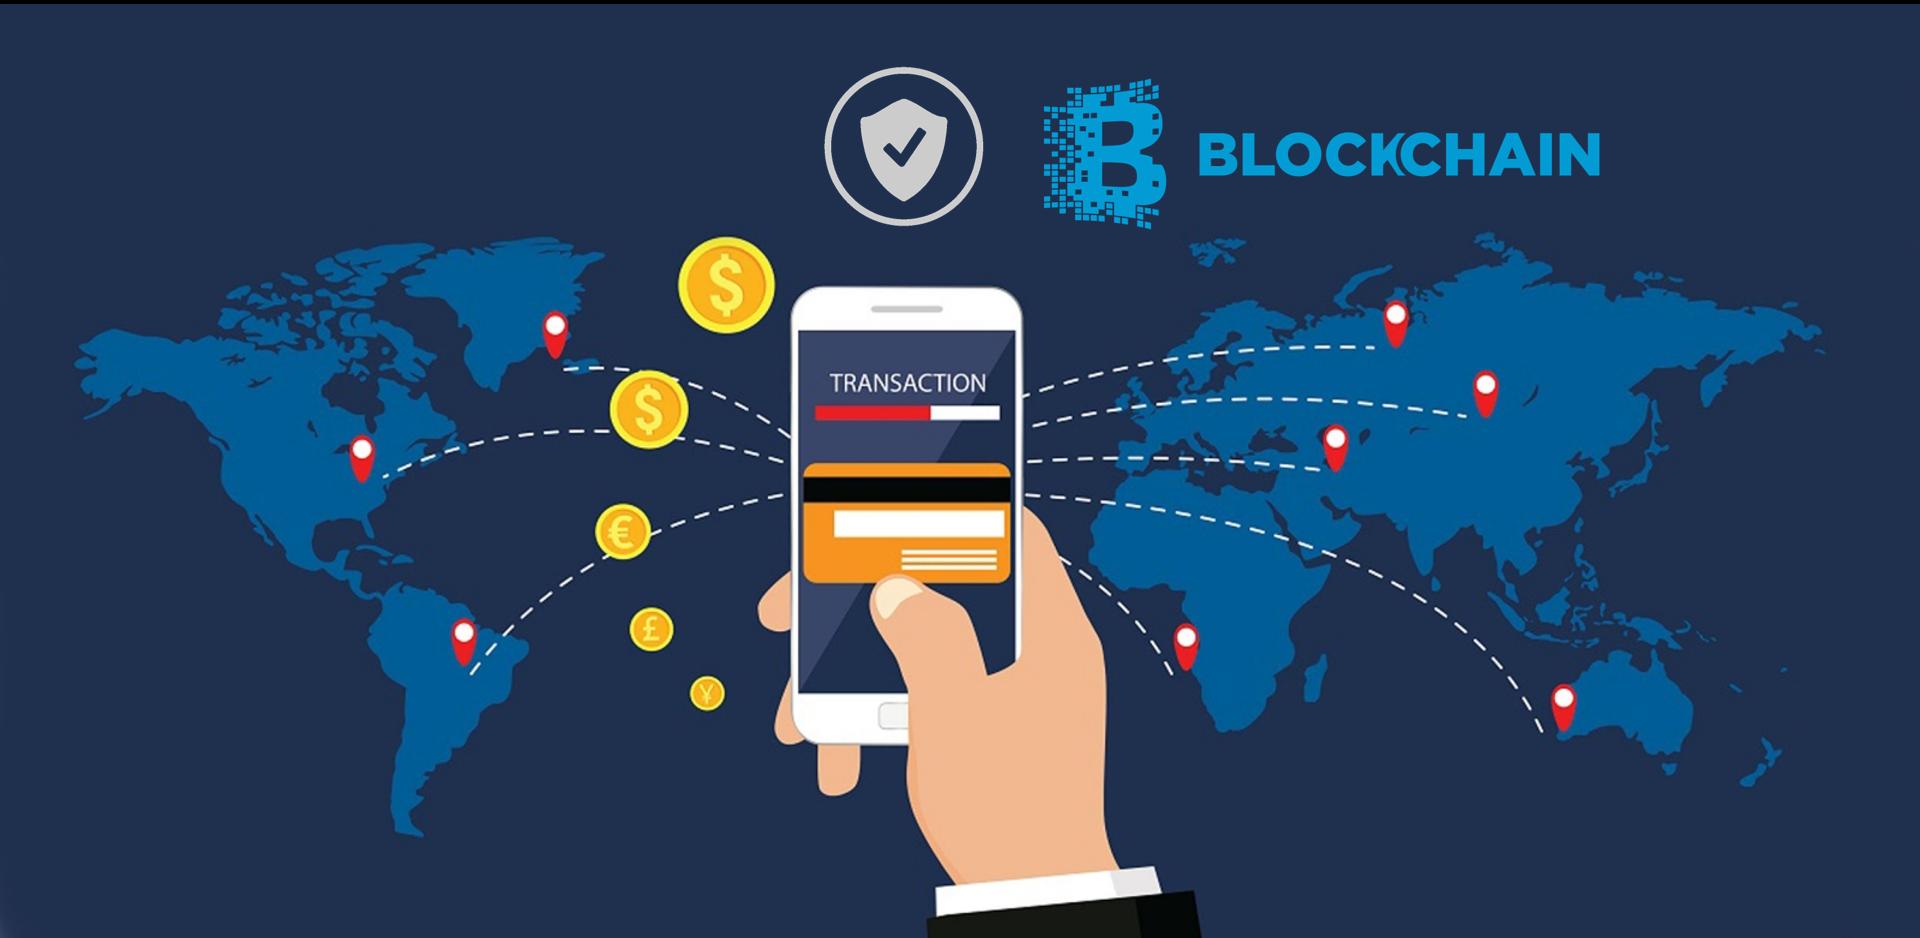 Huong dan bao mat tai khoan blockchain